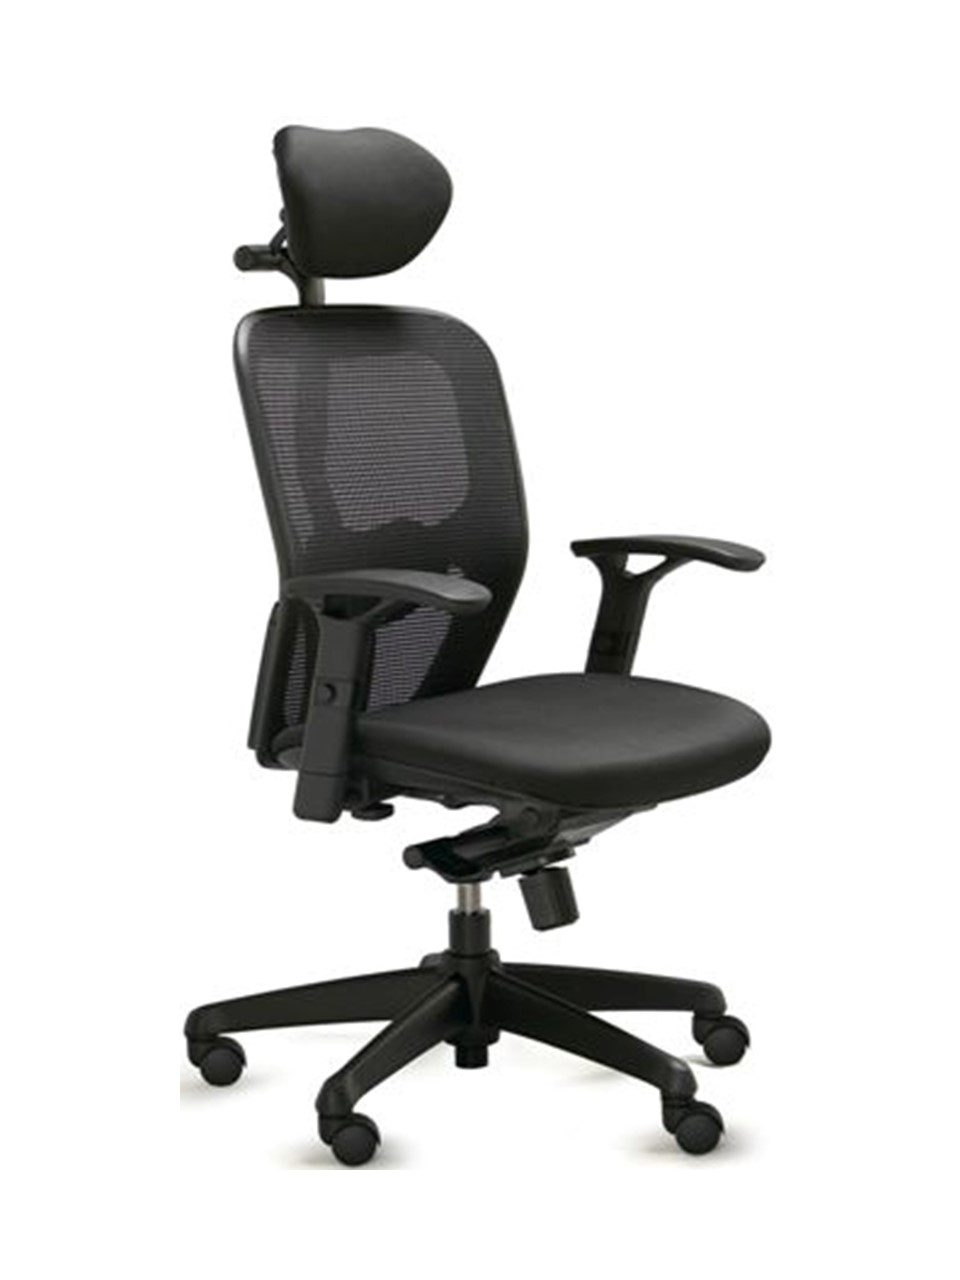 Activ Executive High Back Chair Heavy Duty Bdk Office